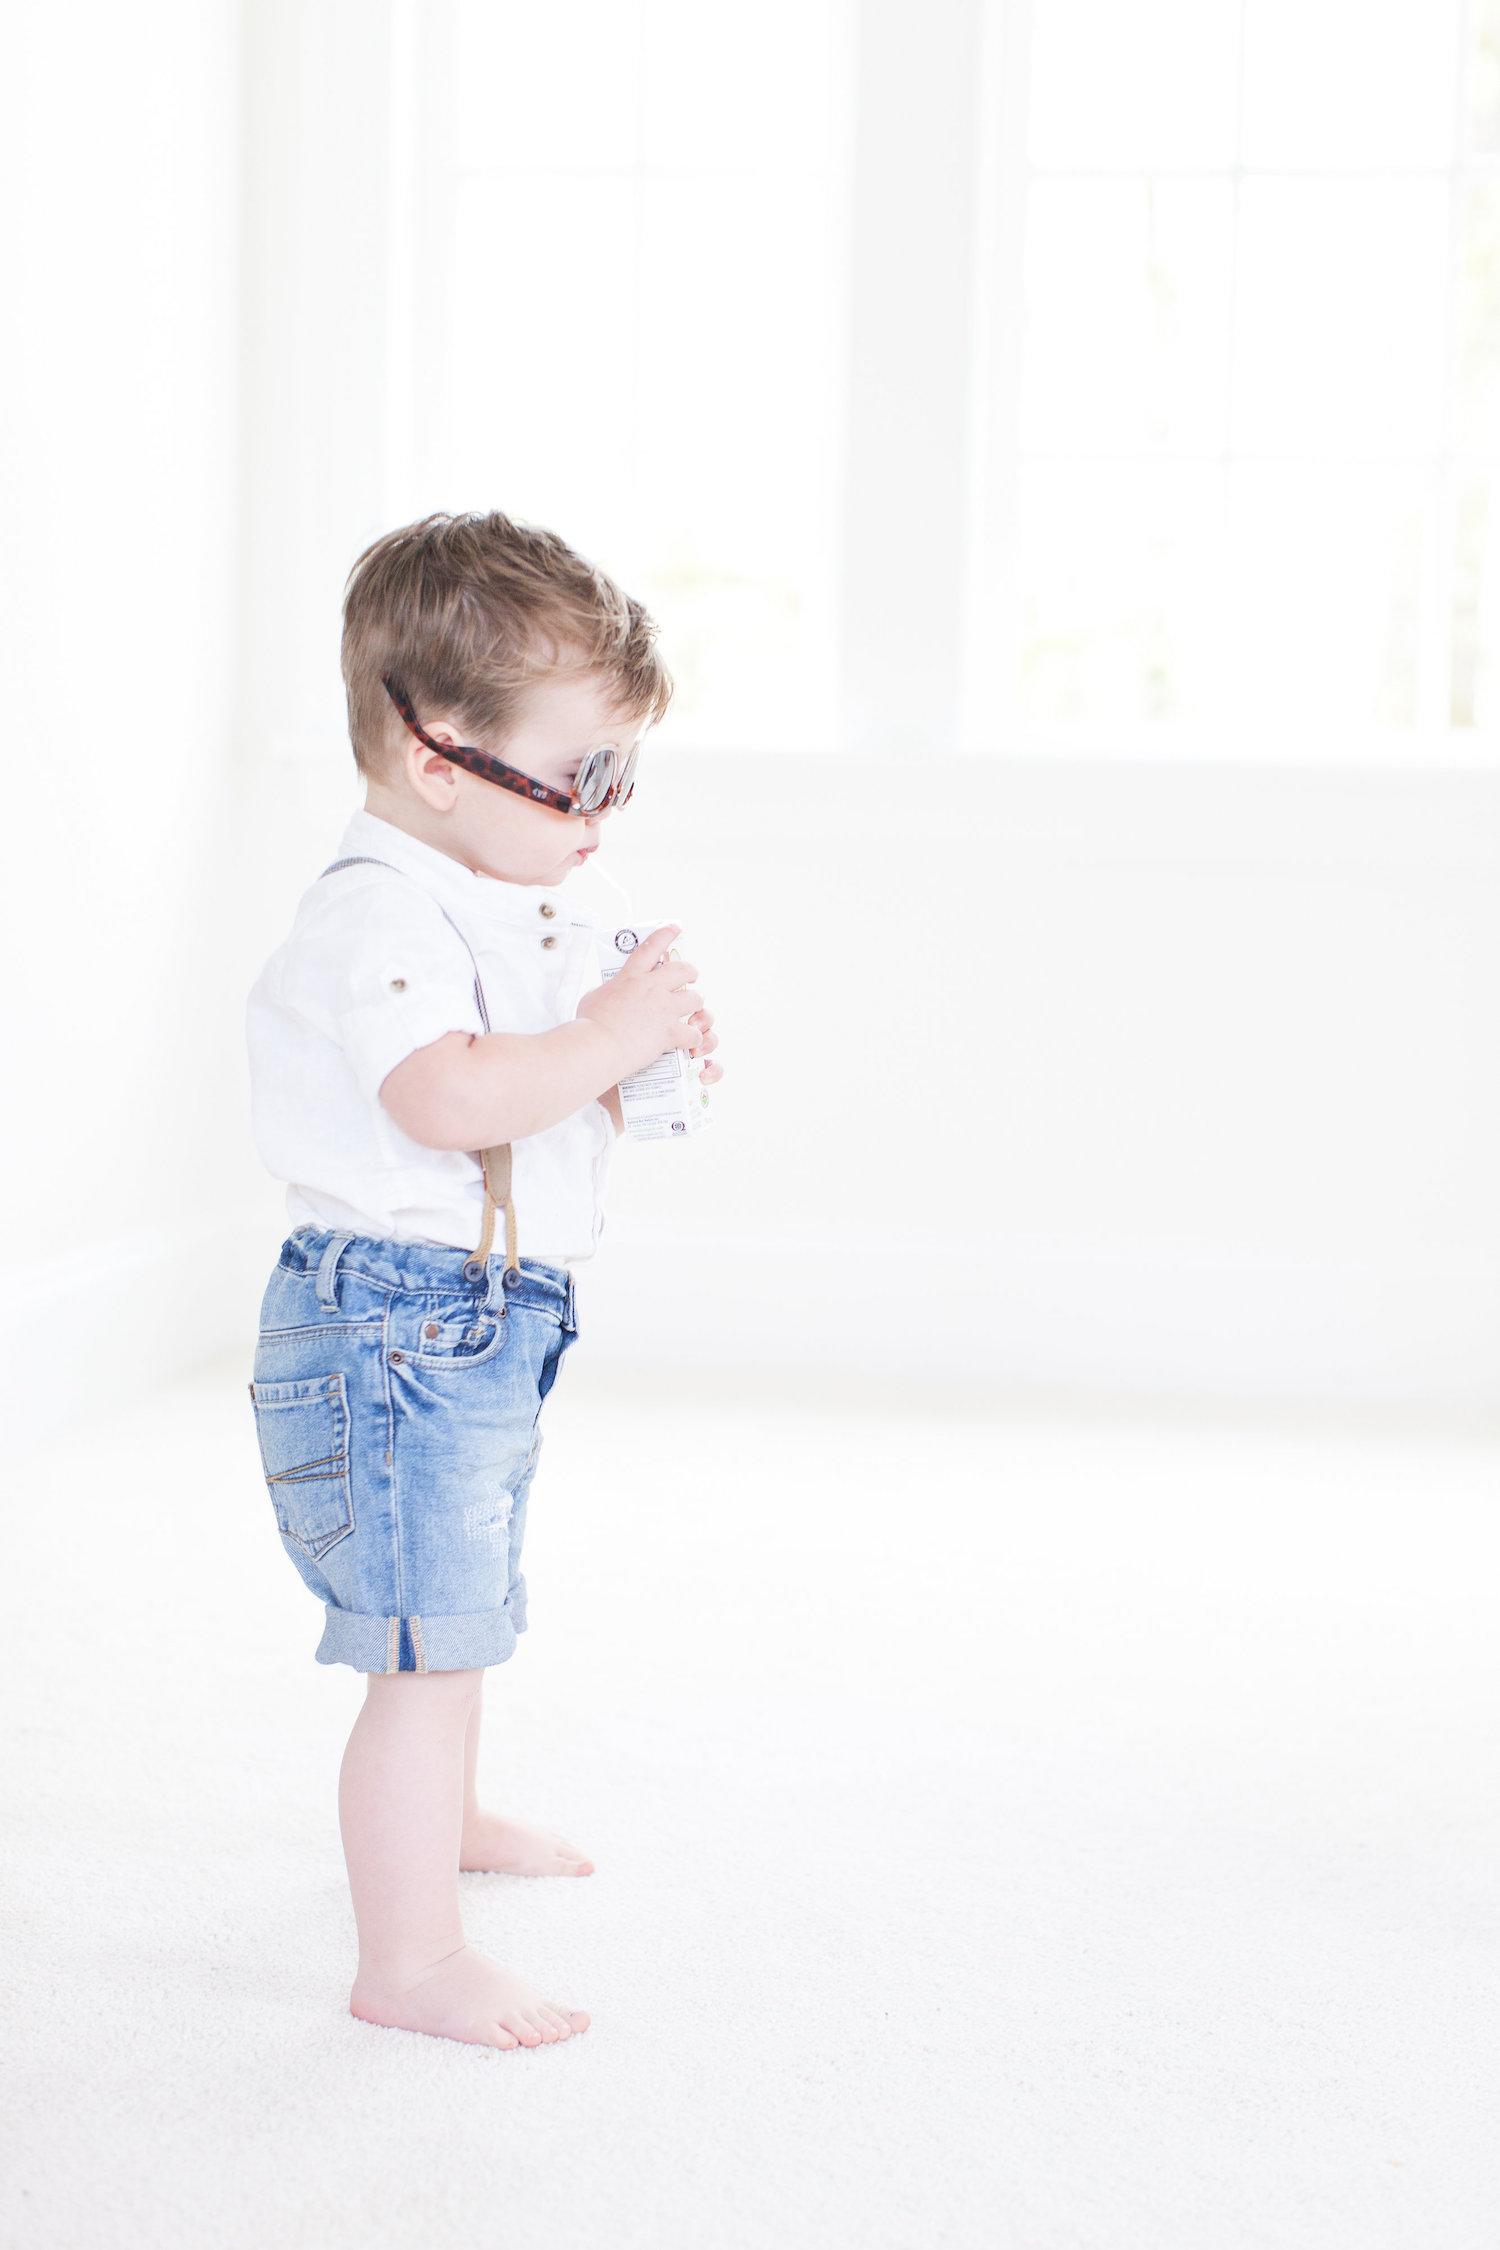 H&M Kids Spring Fashion Monika Hibbs baby boy sunglasses